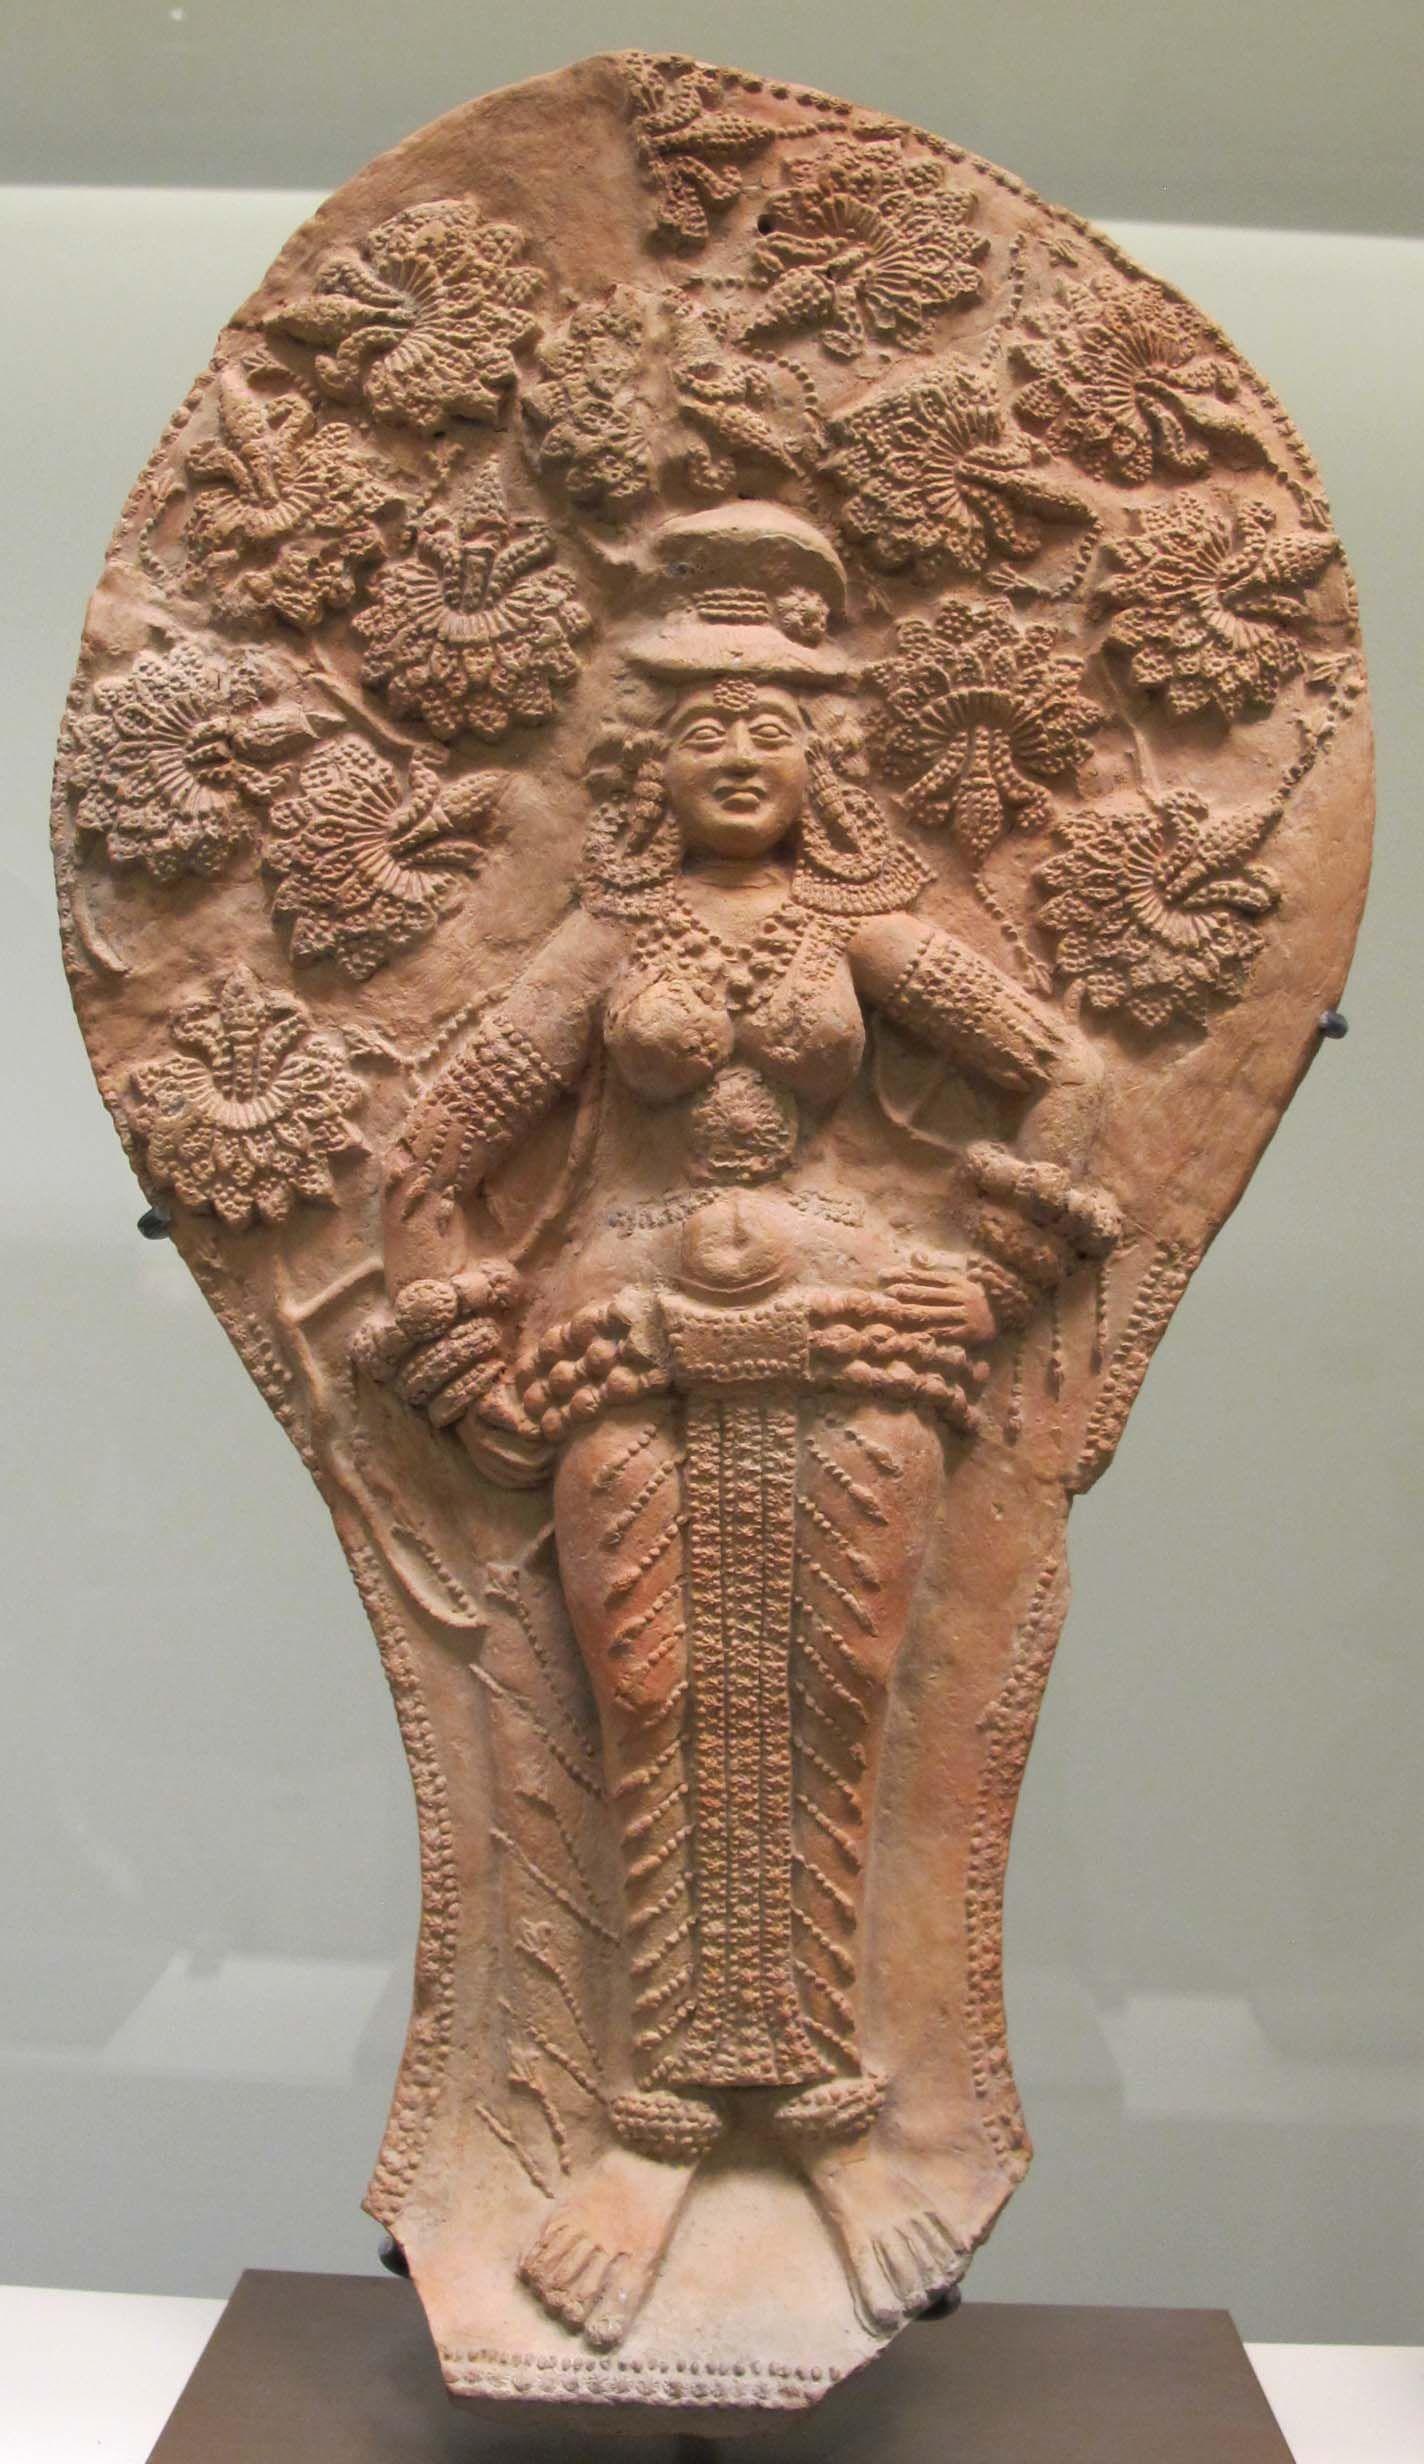 Yakshini. Chandraketugarth, Période Sunga. Terre cuite, iie‑ier siècle av. n. è, H. 20cm env. Musée Guimet